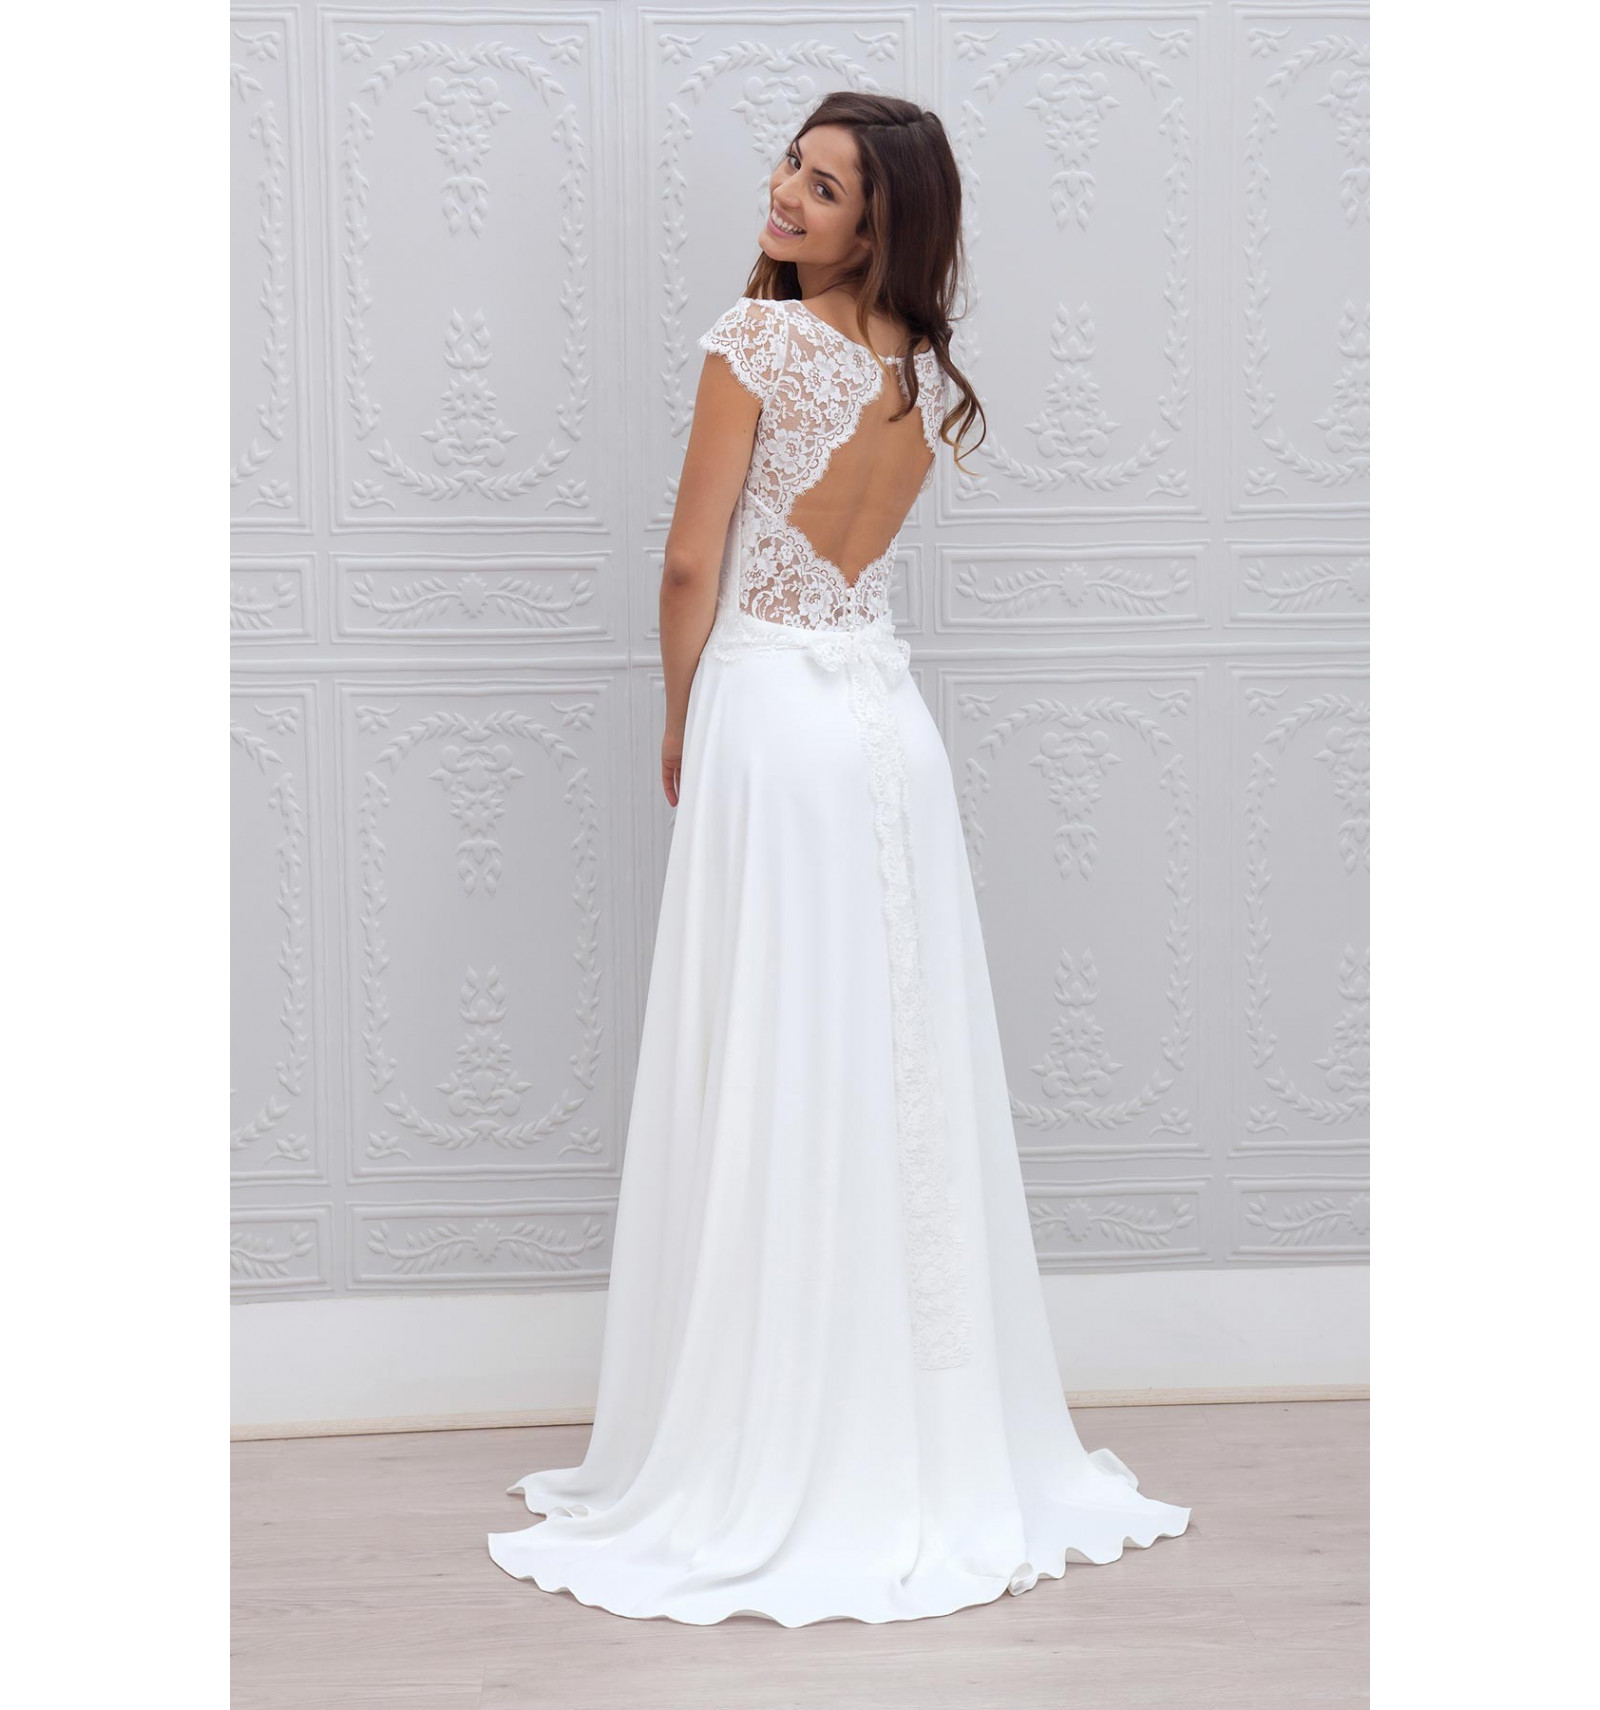 Robe de mariée Cécilia de Marie Laporte à